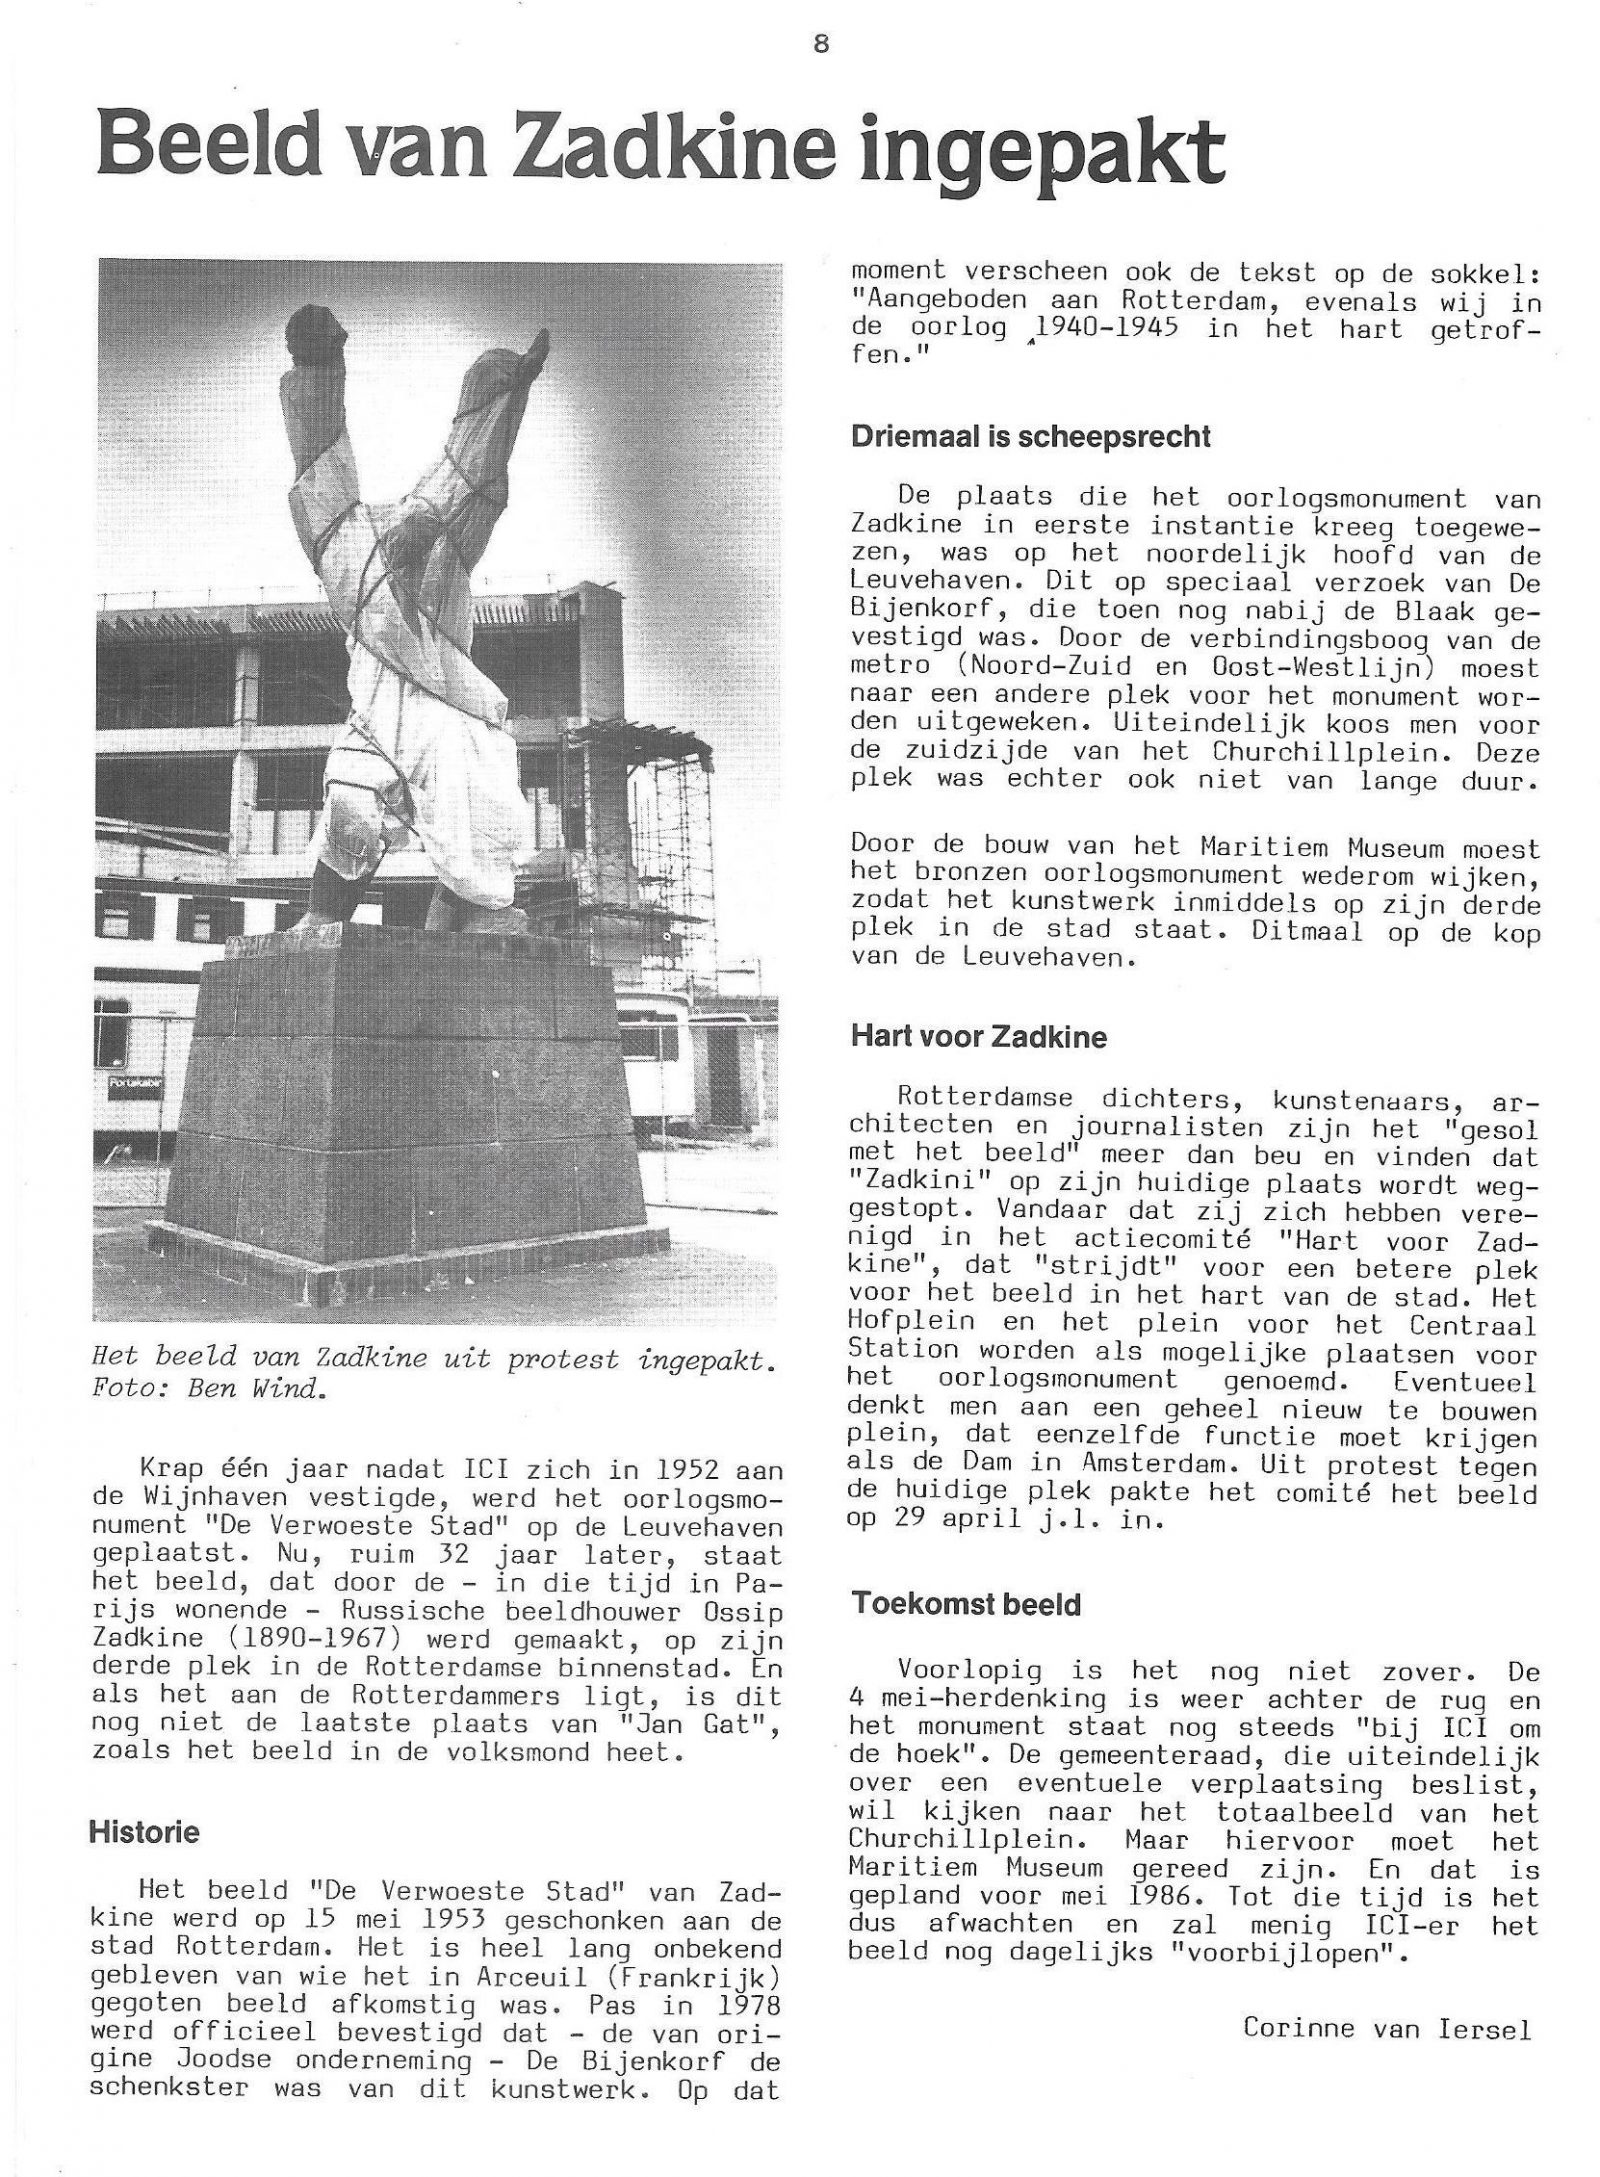 Spreekbuis sep 1985 Beeld van Zadkine ingepakt